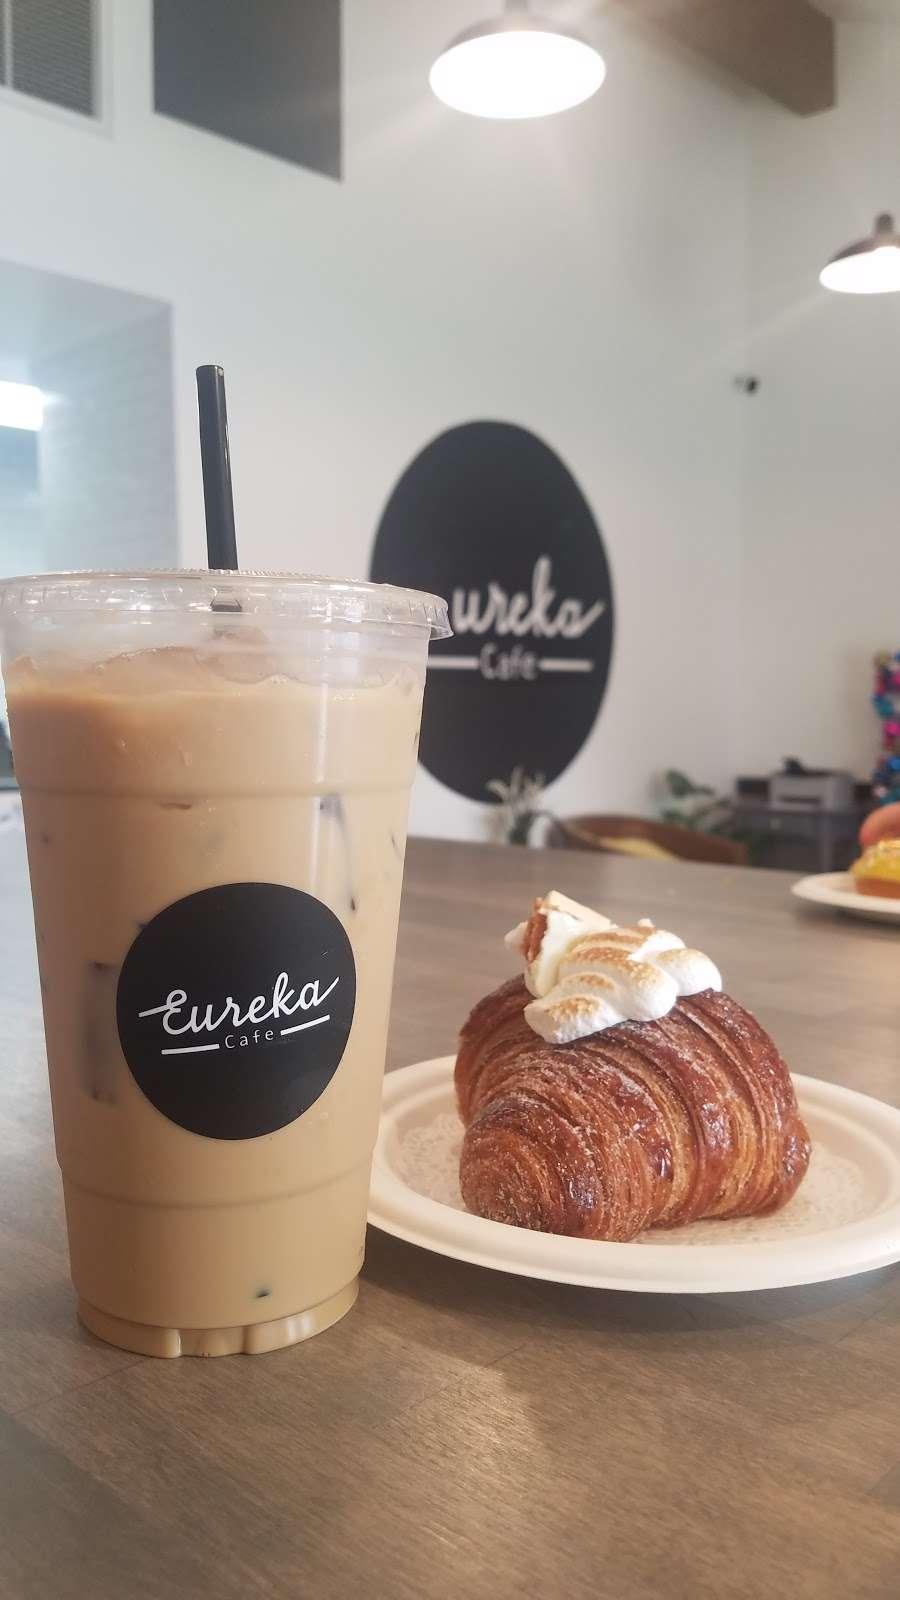 Yureka Cafe - cafe  | Photo 3 of 10 | Address: 401 E Foothill Blvd, Azusa, CA 91702, USA